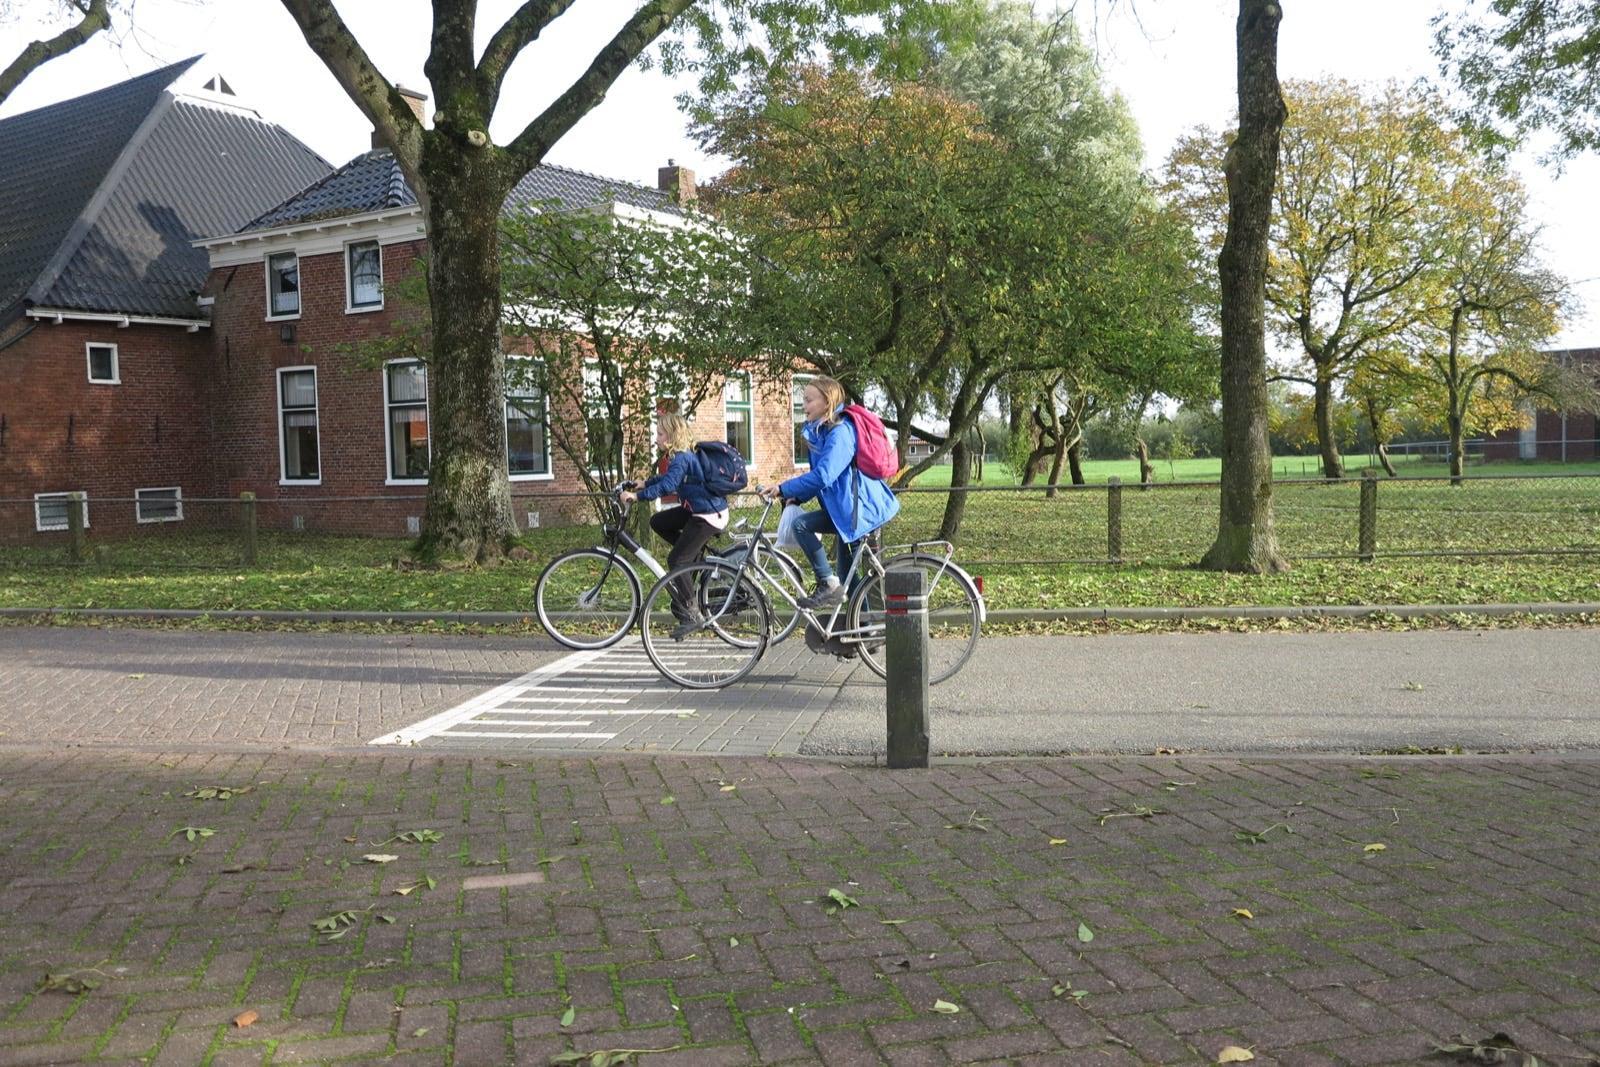 et-fiets-en-fietser-96-schoolvriendinnen-janke-holtman-en-lieke-v.d.-veen-oi.jpg